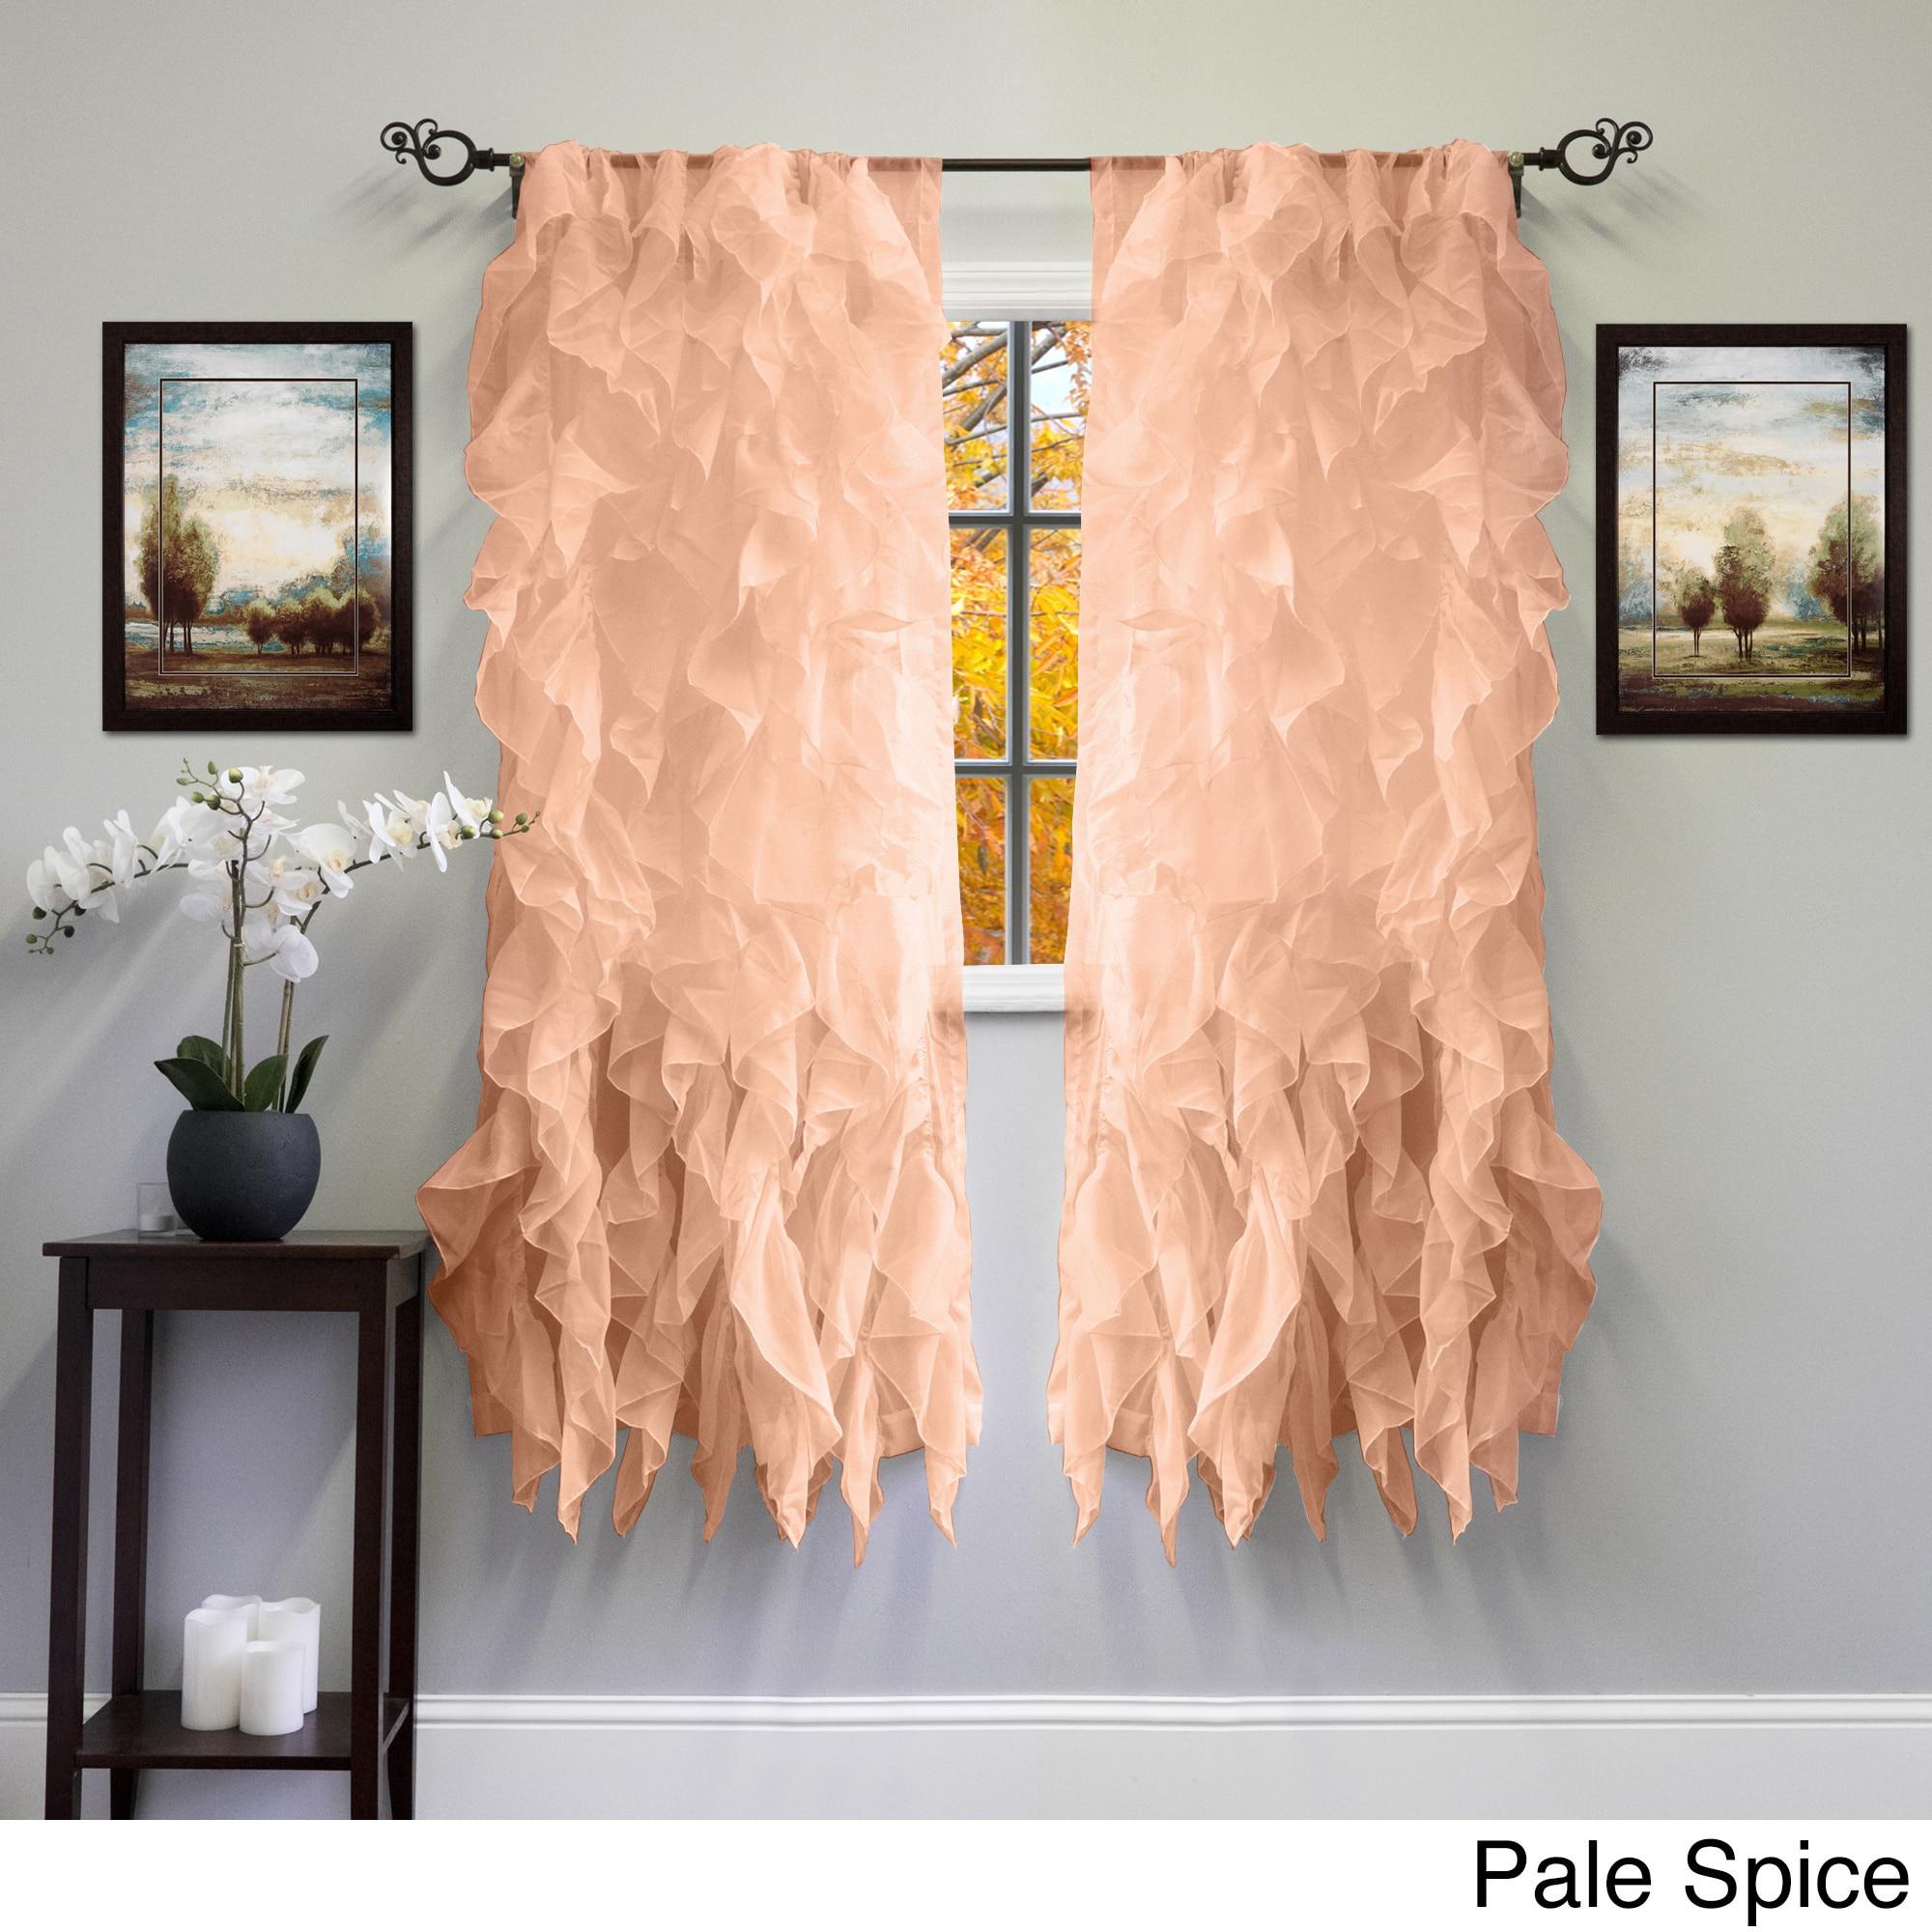 ruffle eclipse my blackout ip batiste com panel walmart scene curtain window curtains